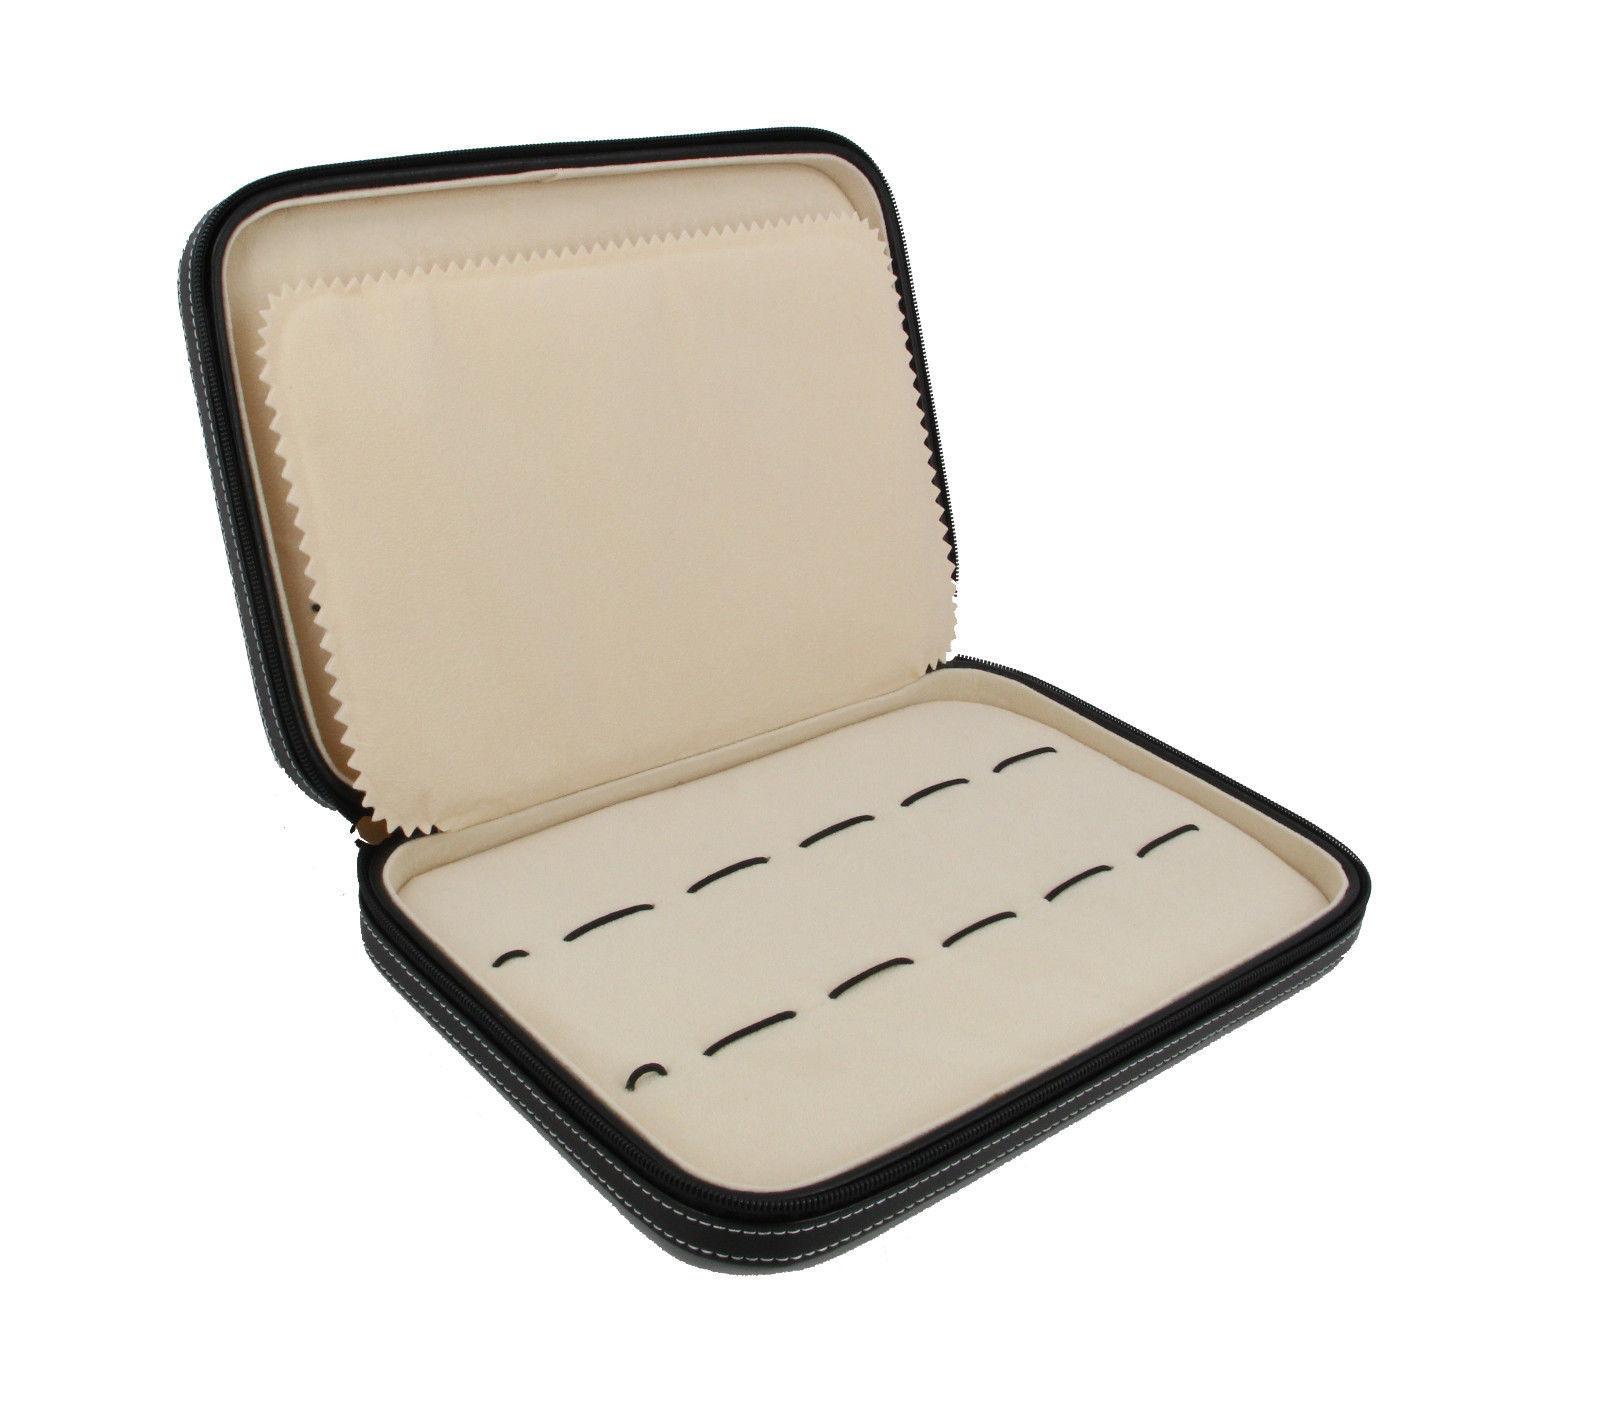 Decorebay Executive High class 10-slot Watch Strap Slot Leather Box New Gift